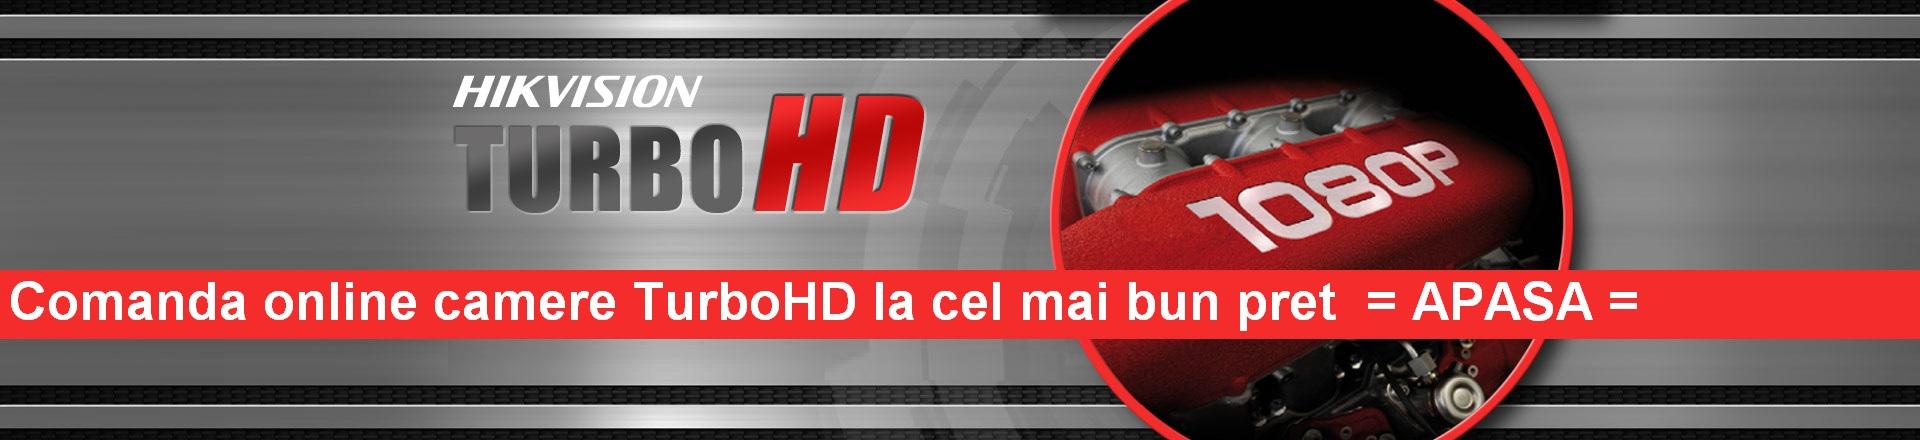 Hikvision-CCTV-Turbo-HD-ezCCTV-Banner-1920x440